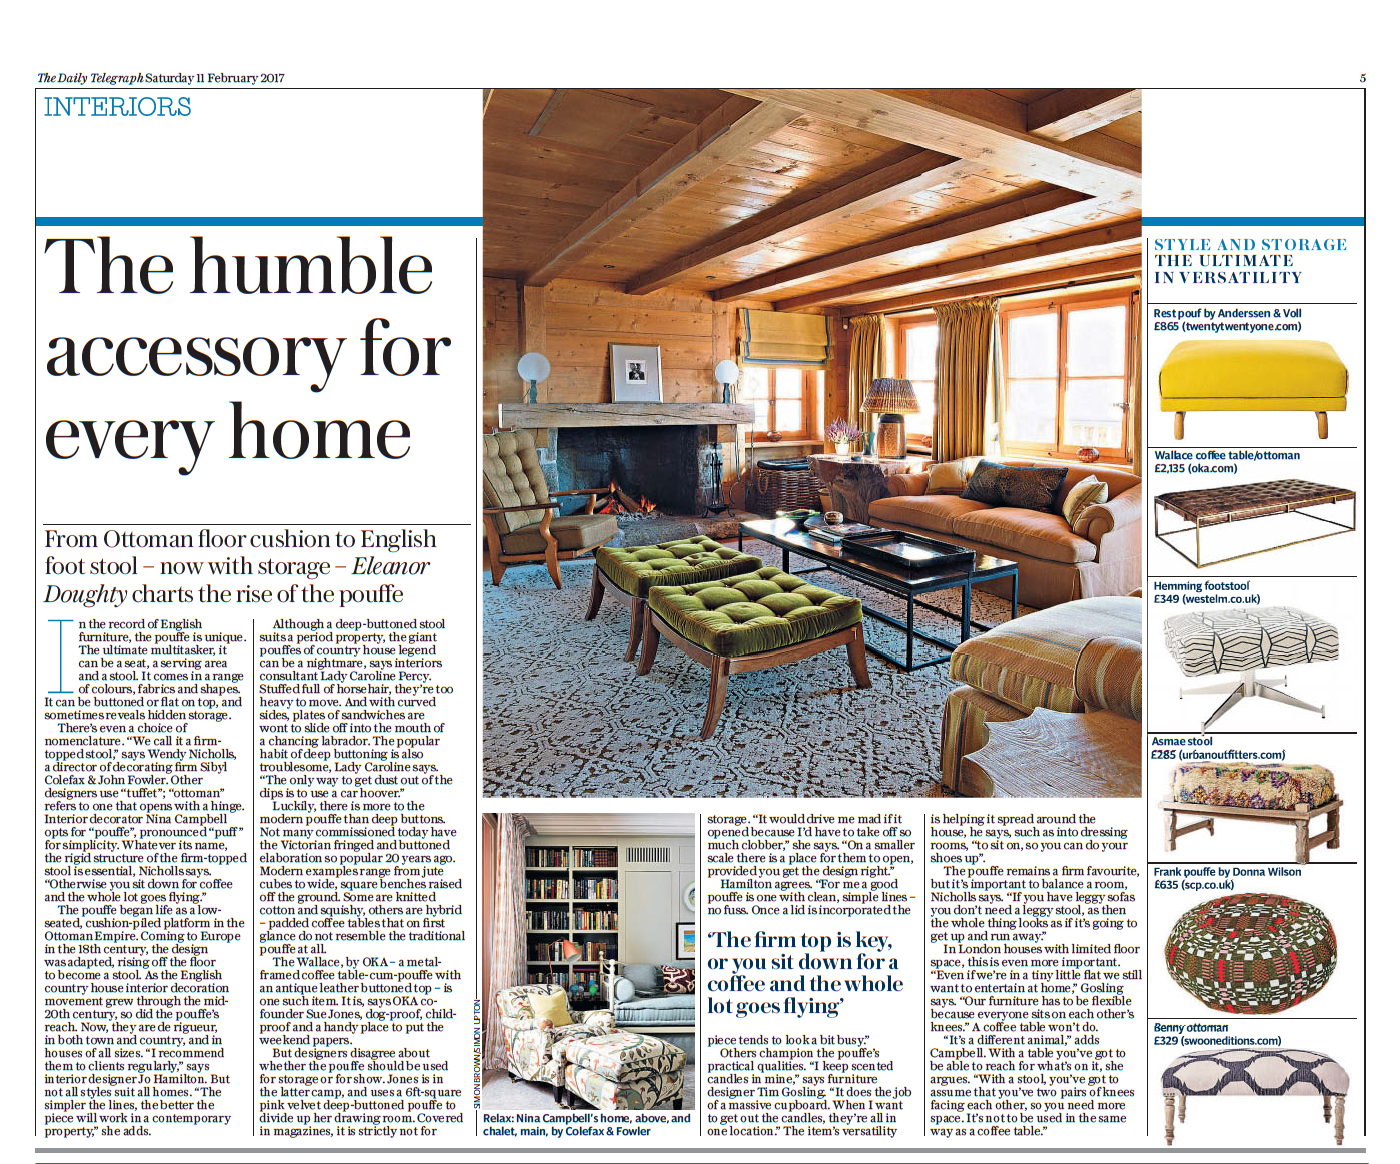 High end interior designer Jo Hamilton Daily Telegraph February 11 2017